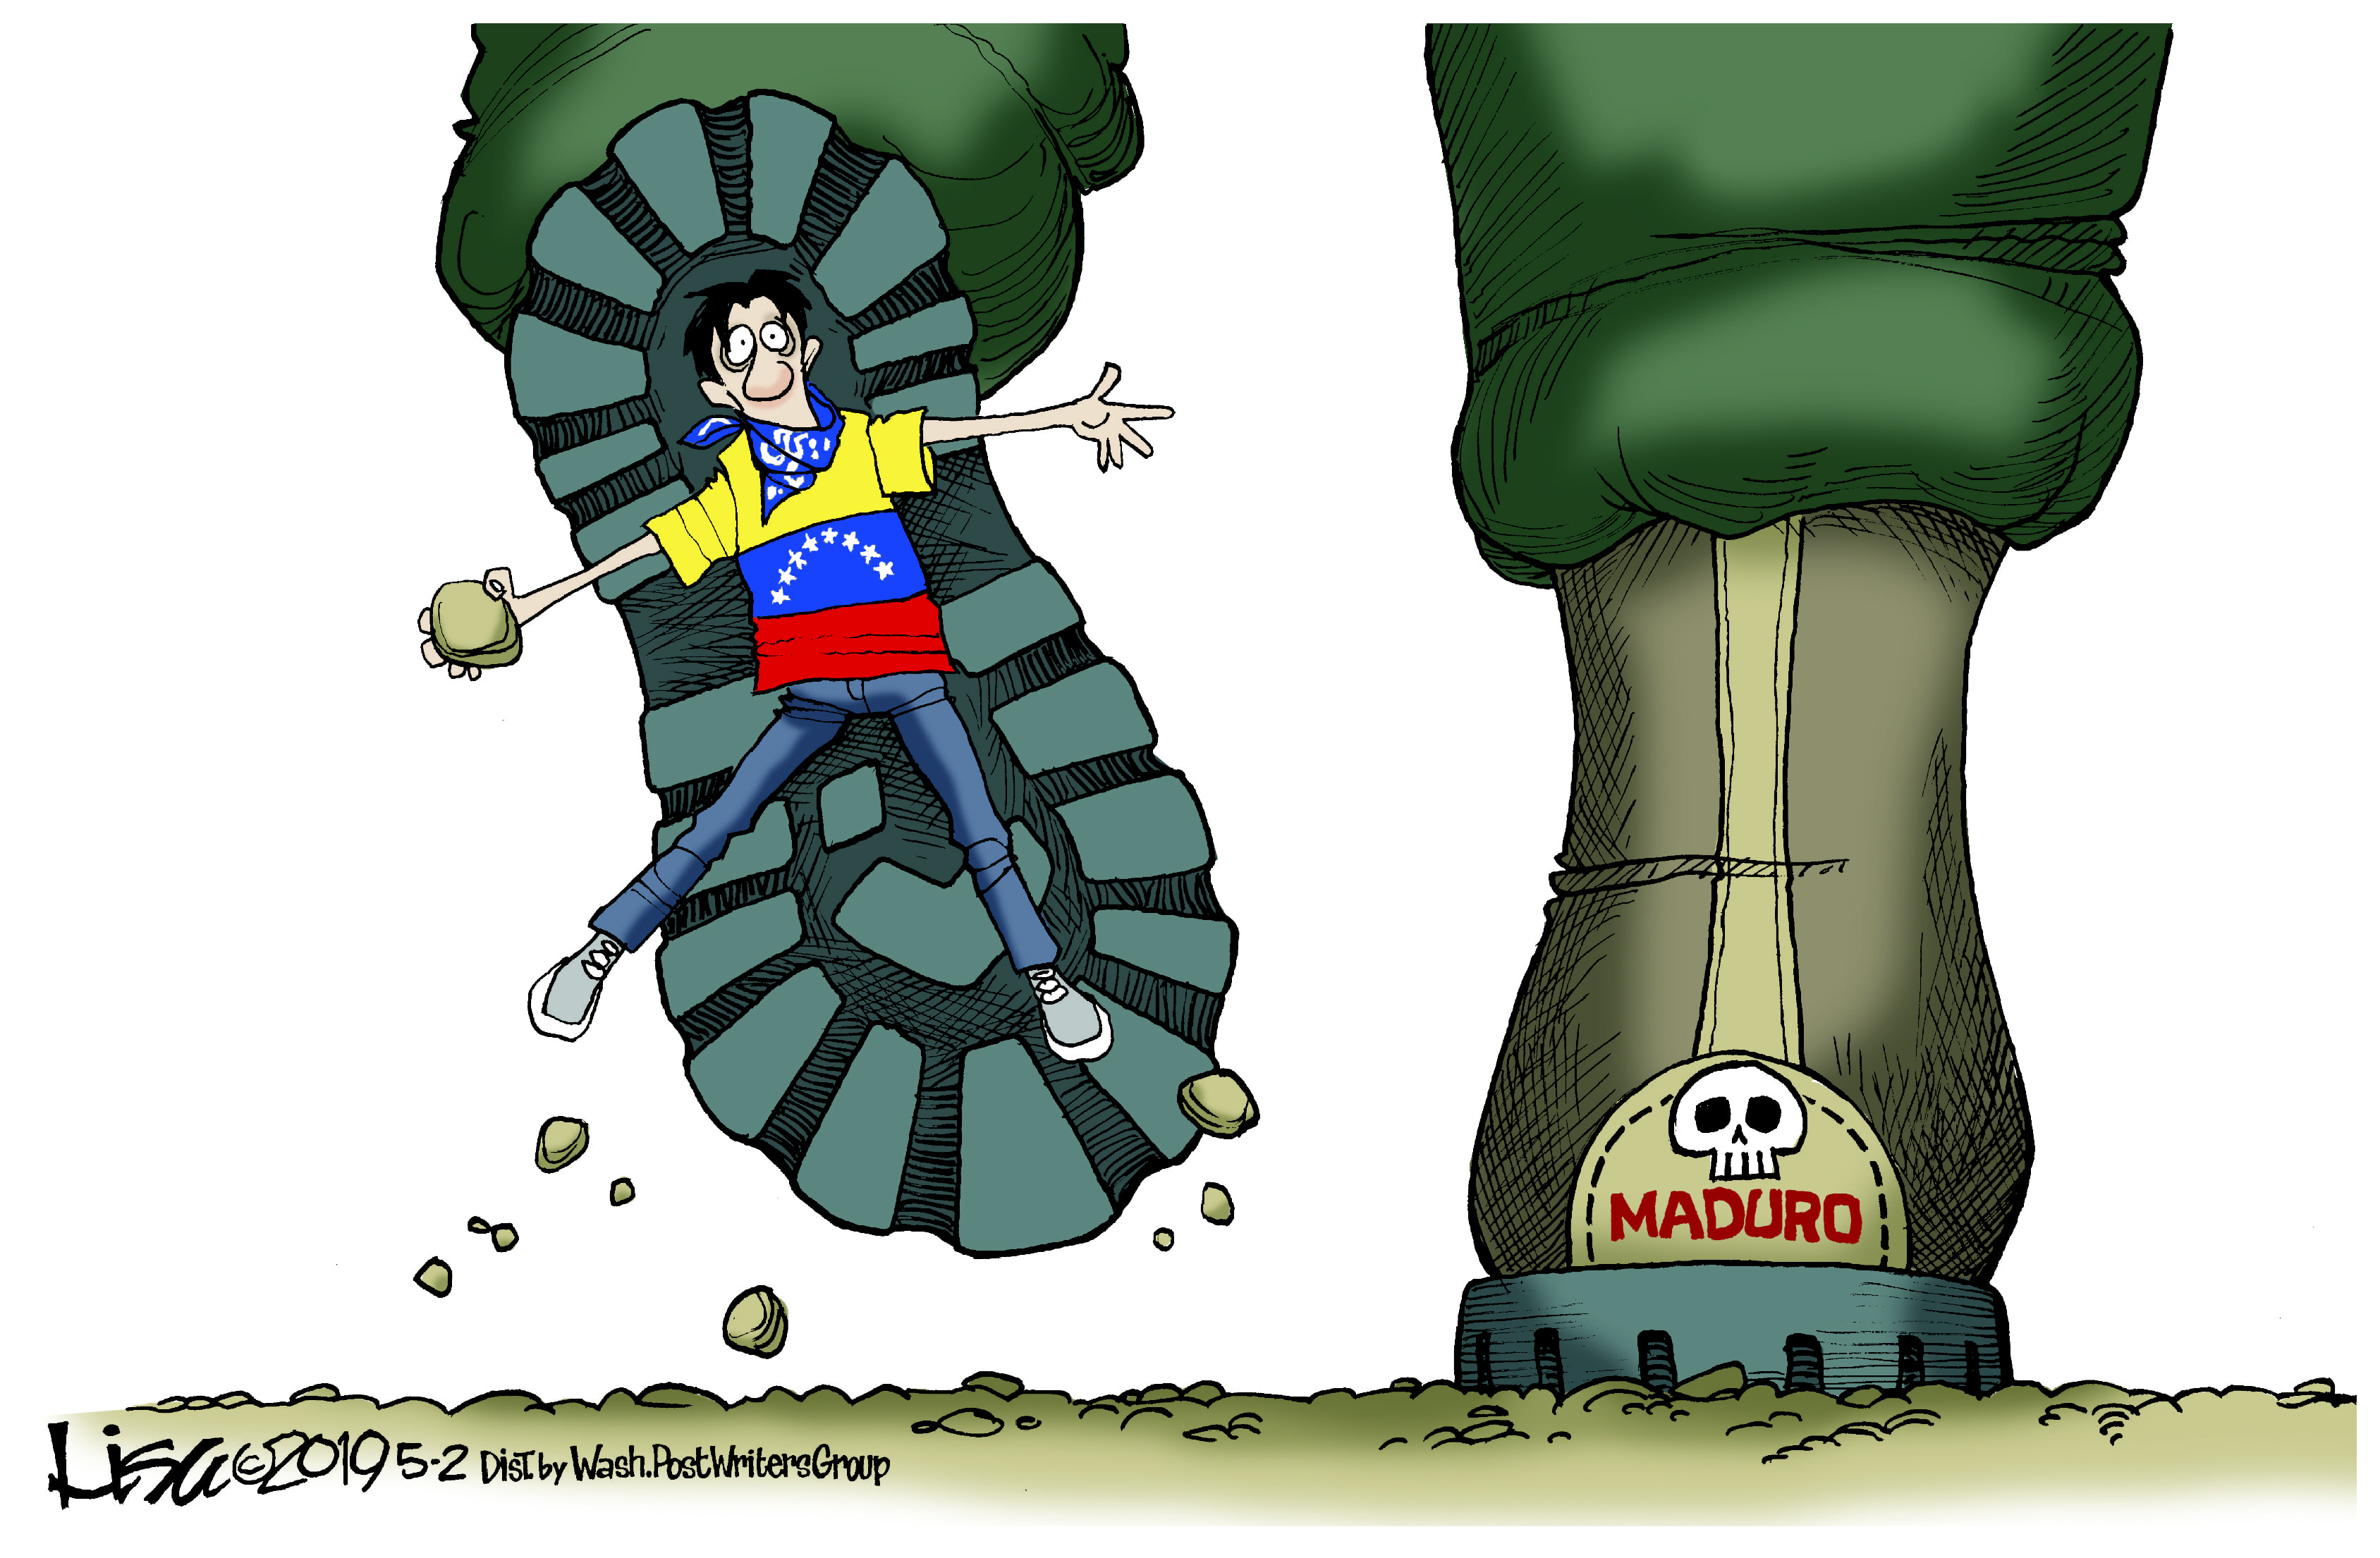 May 4: Venezuela